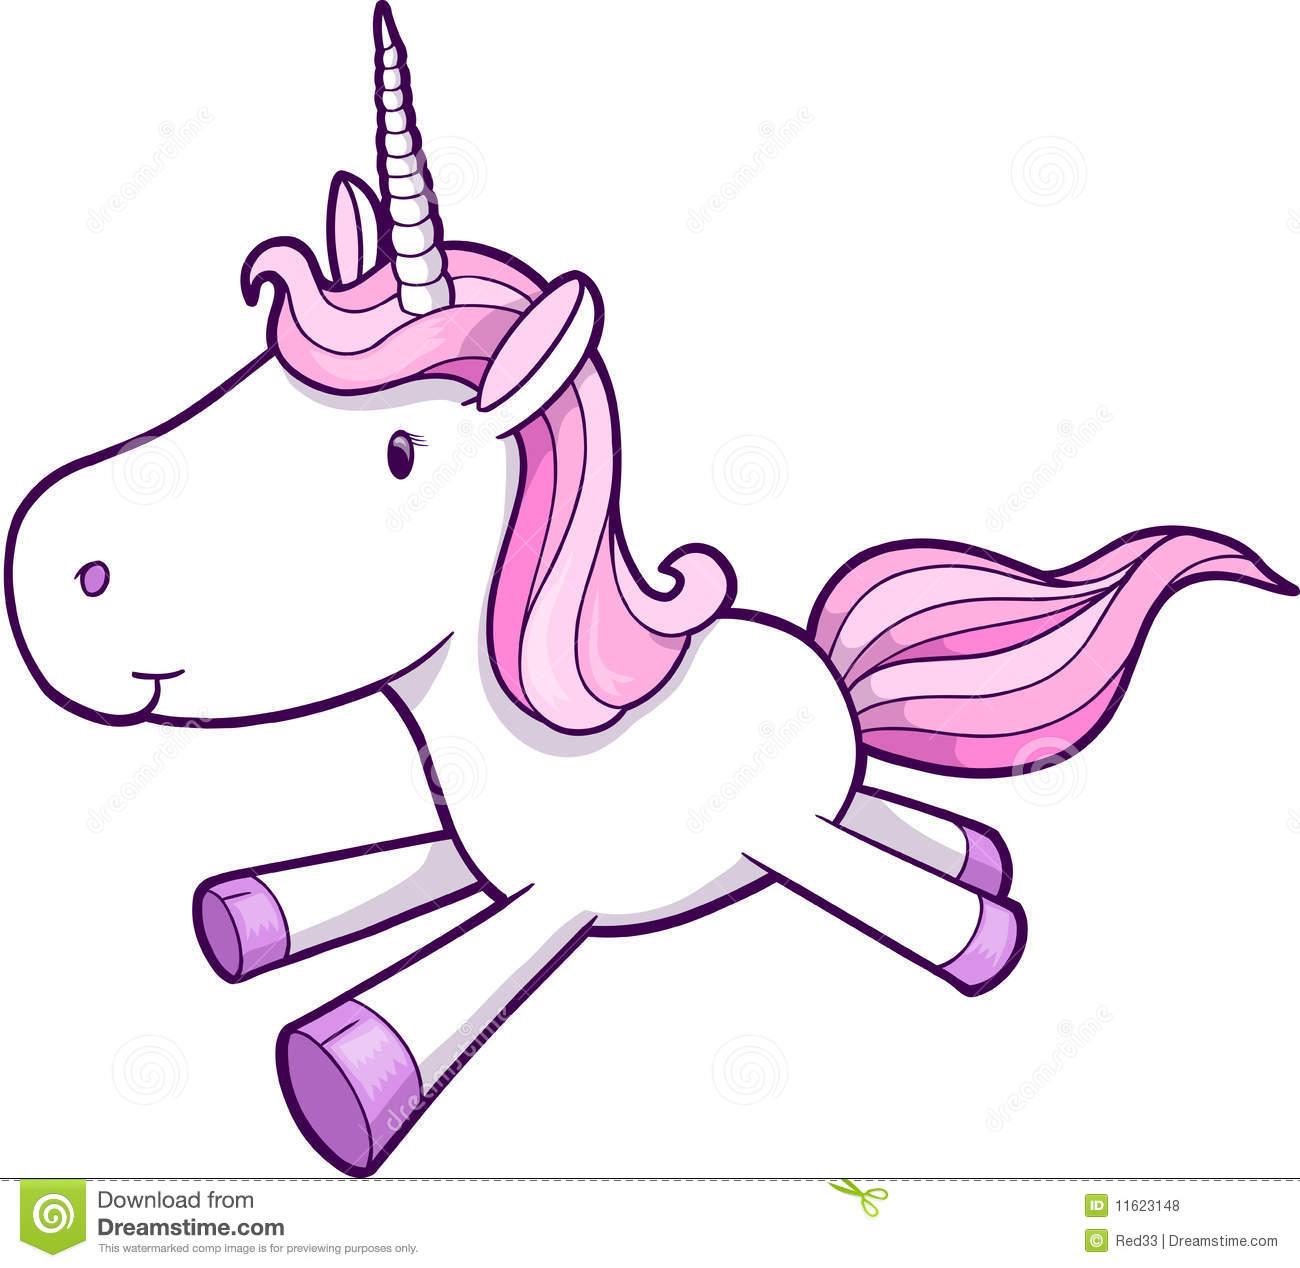 Unicorn Clipart Free & Unicorn Clip Art Images.